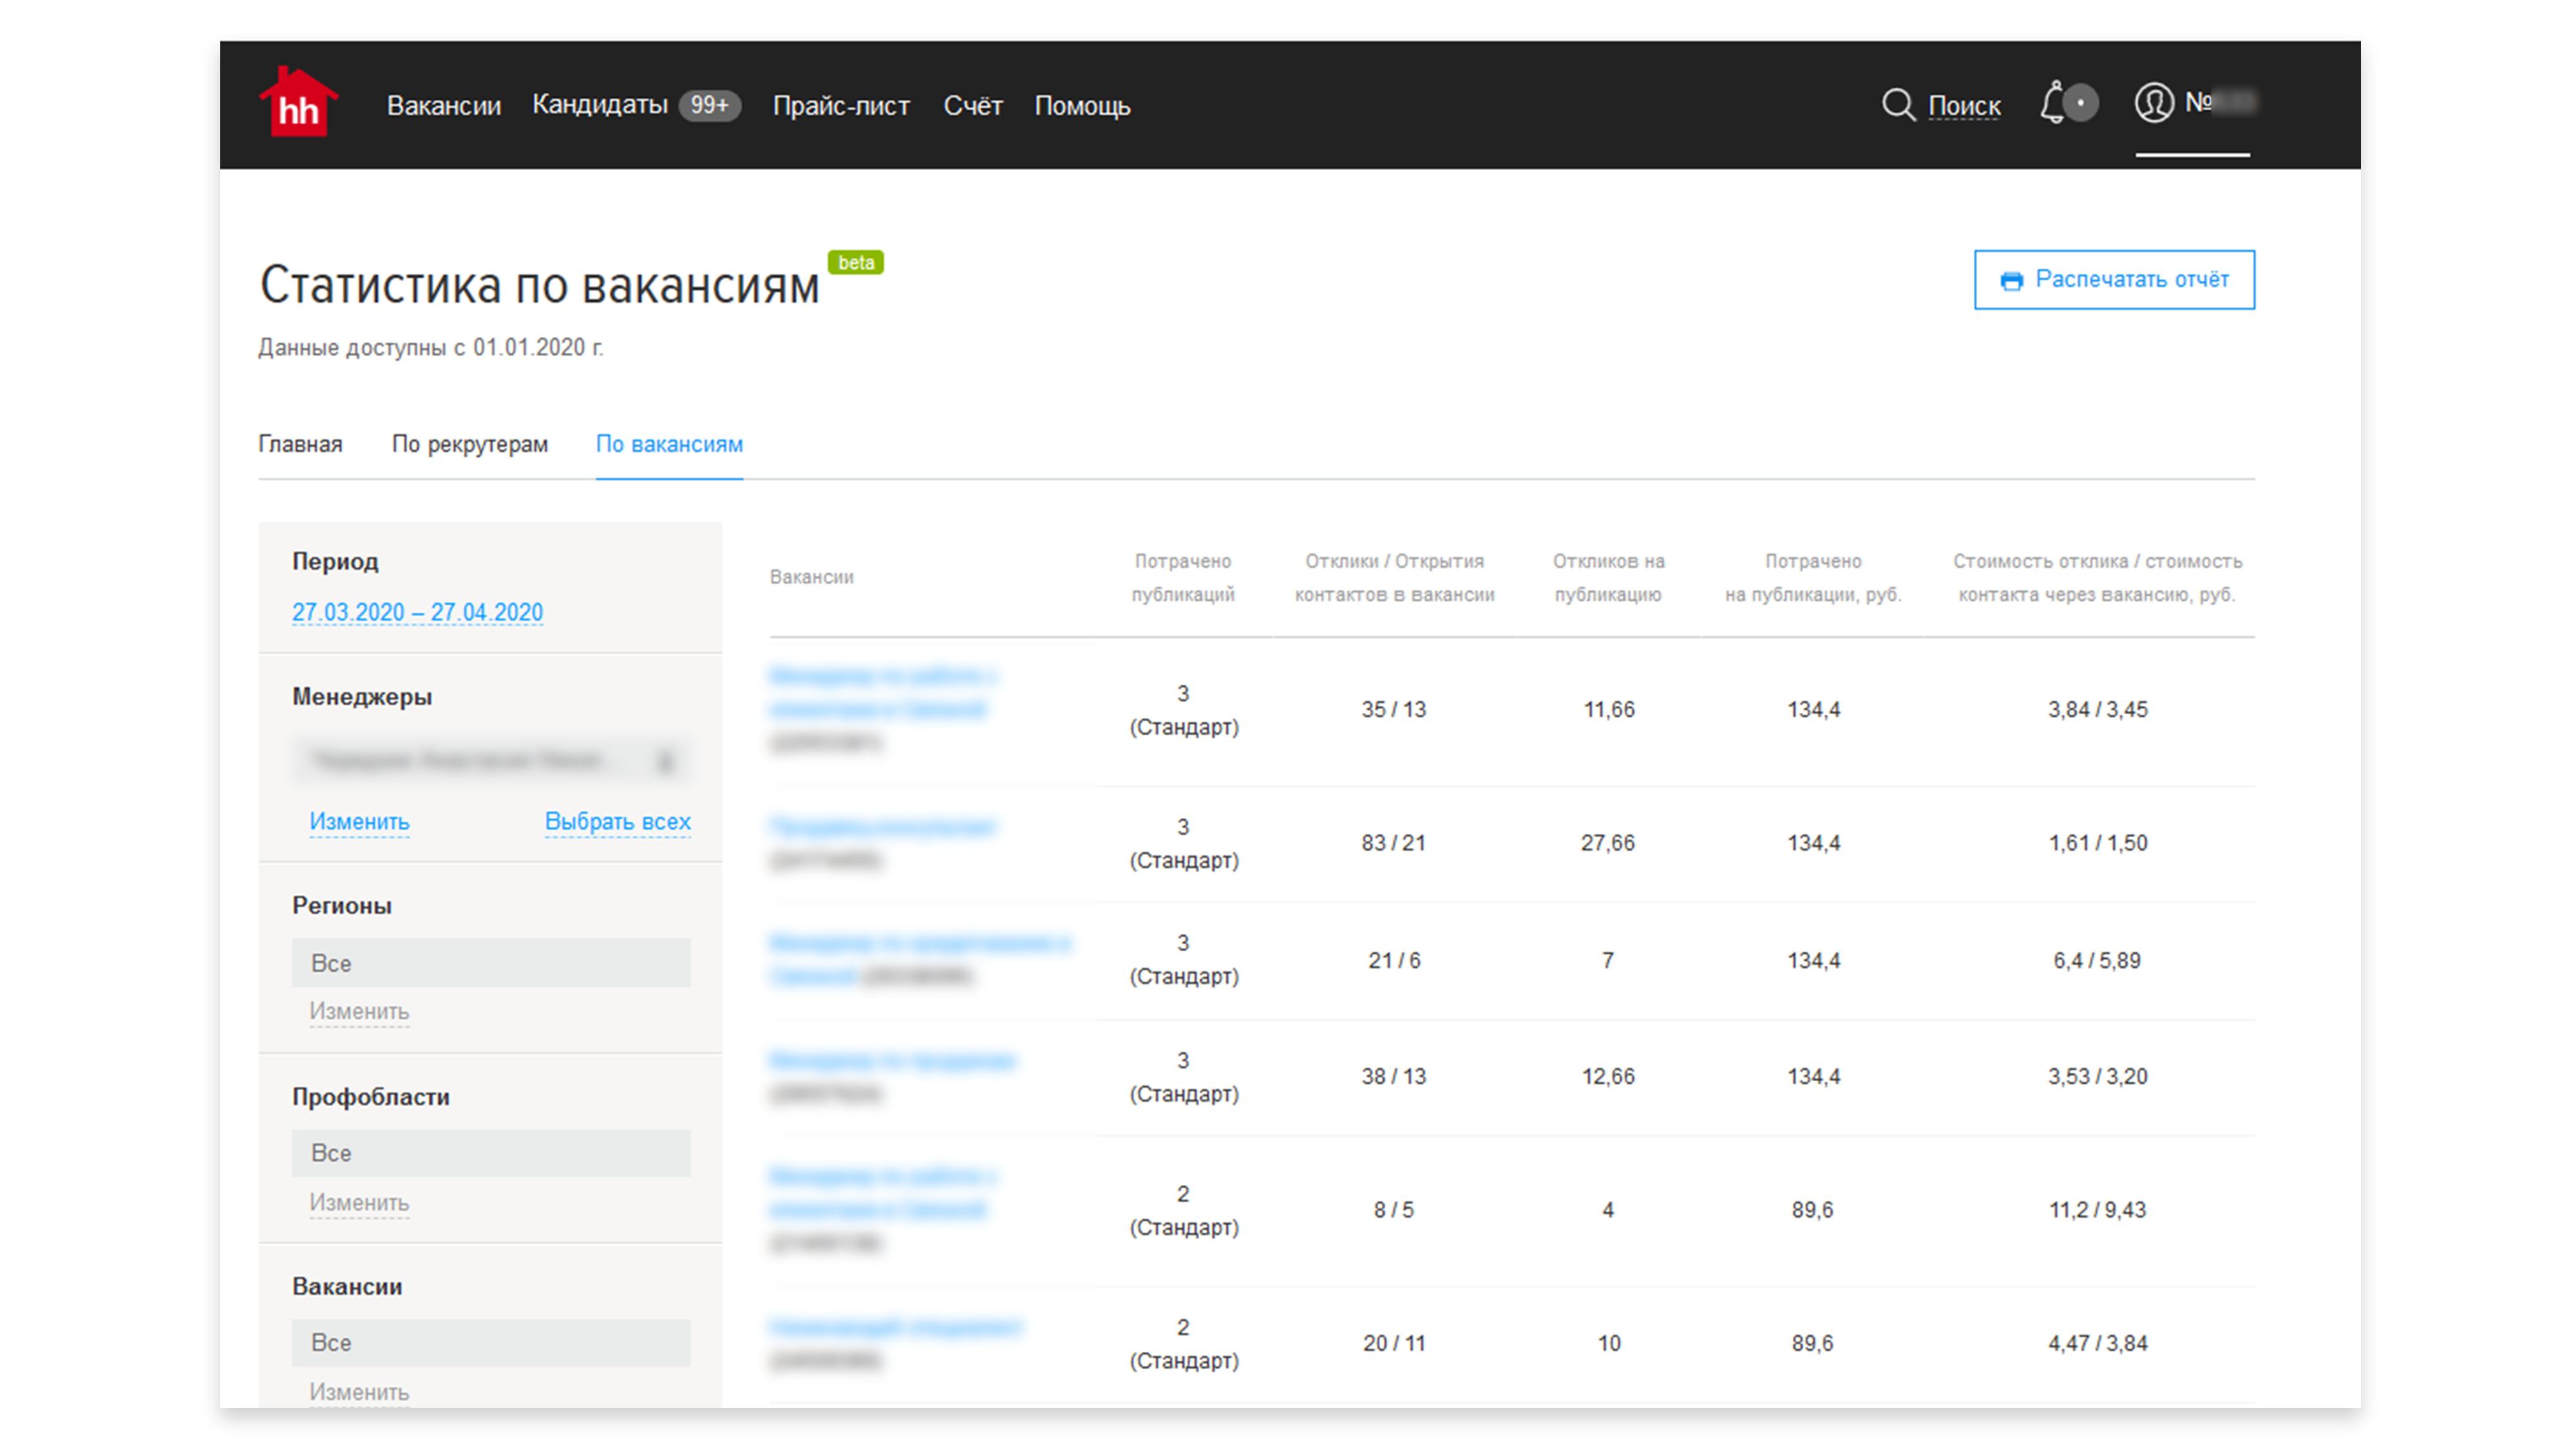 Новая статистика по эффективности подбора на hh.ru